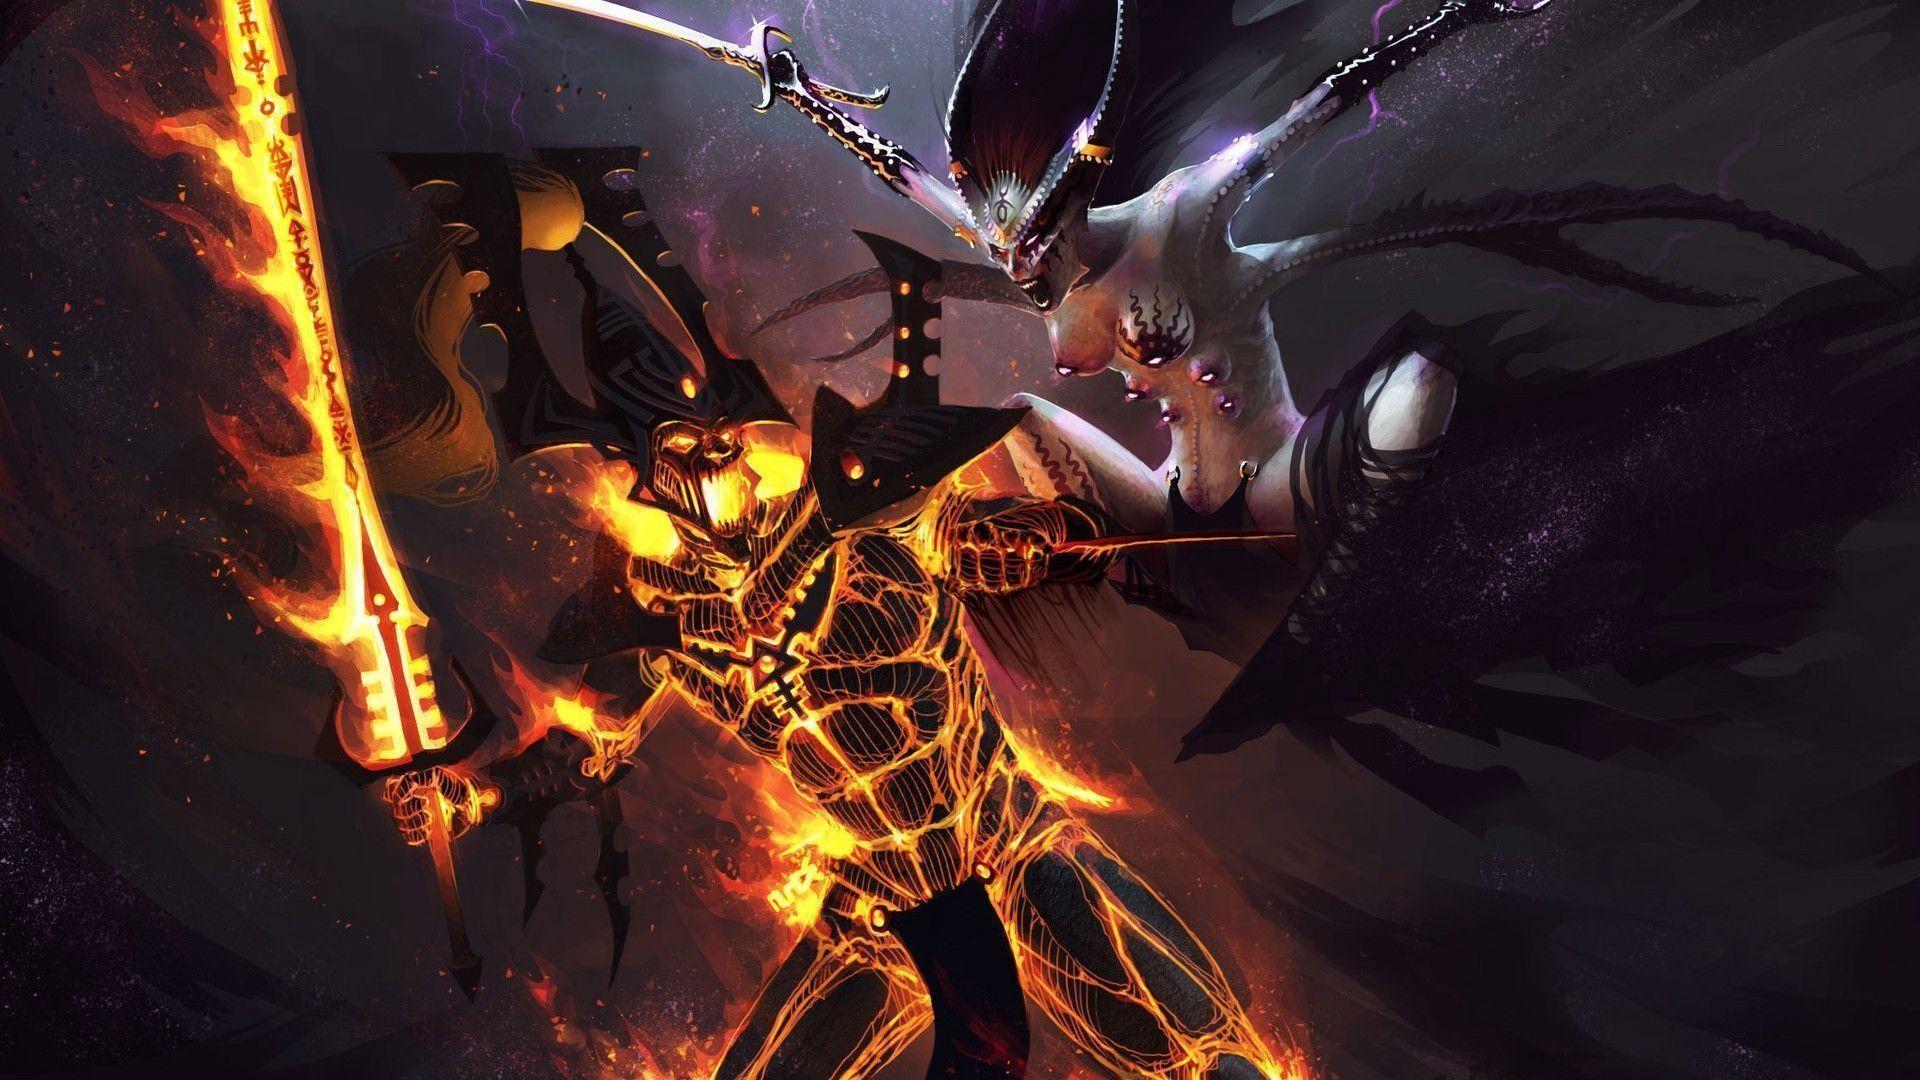 Warhammer 40K Eldar Desktop Background Wallpaper HD – dlwallhd.